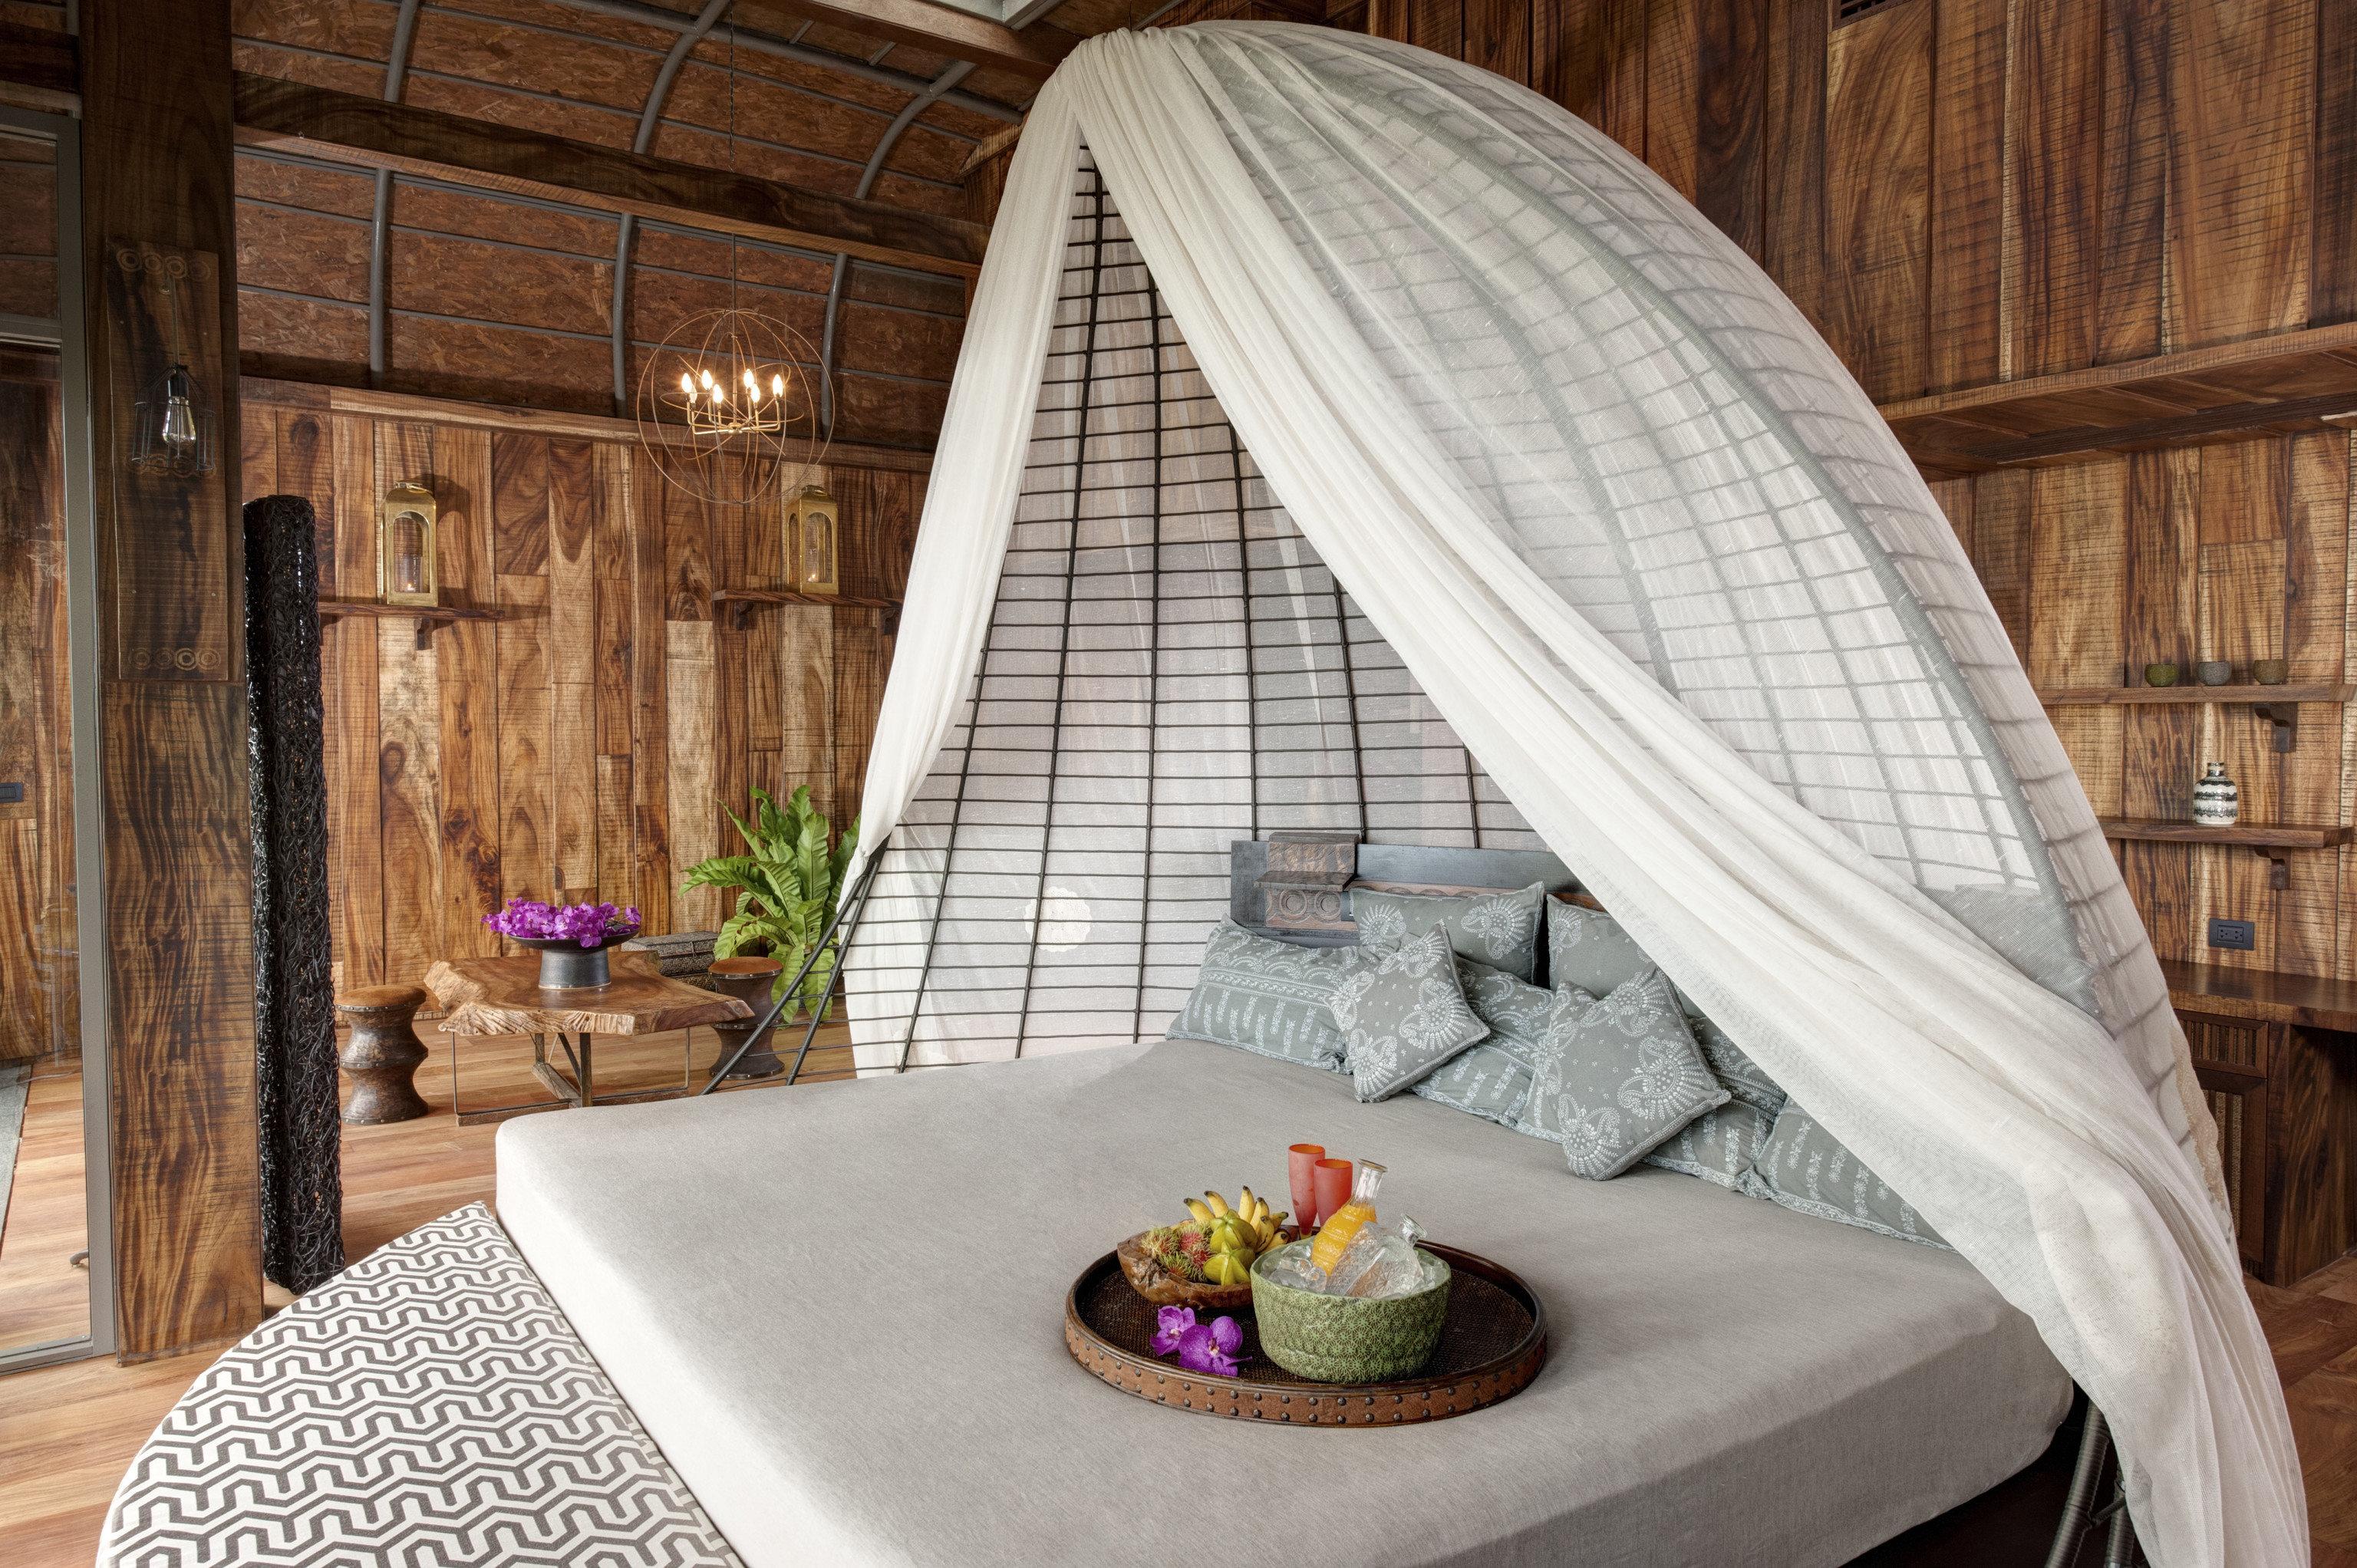 Hotels room property indoor swimming pool wooden interior design cottage estate wood jacuzzi Suite